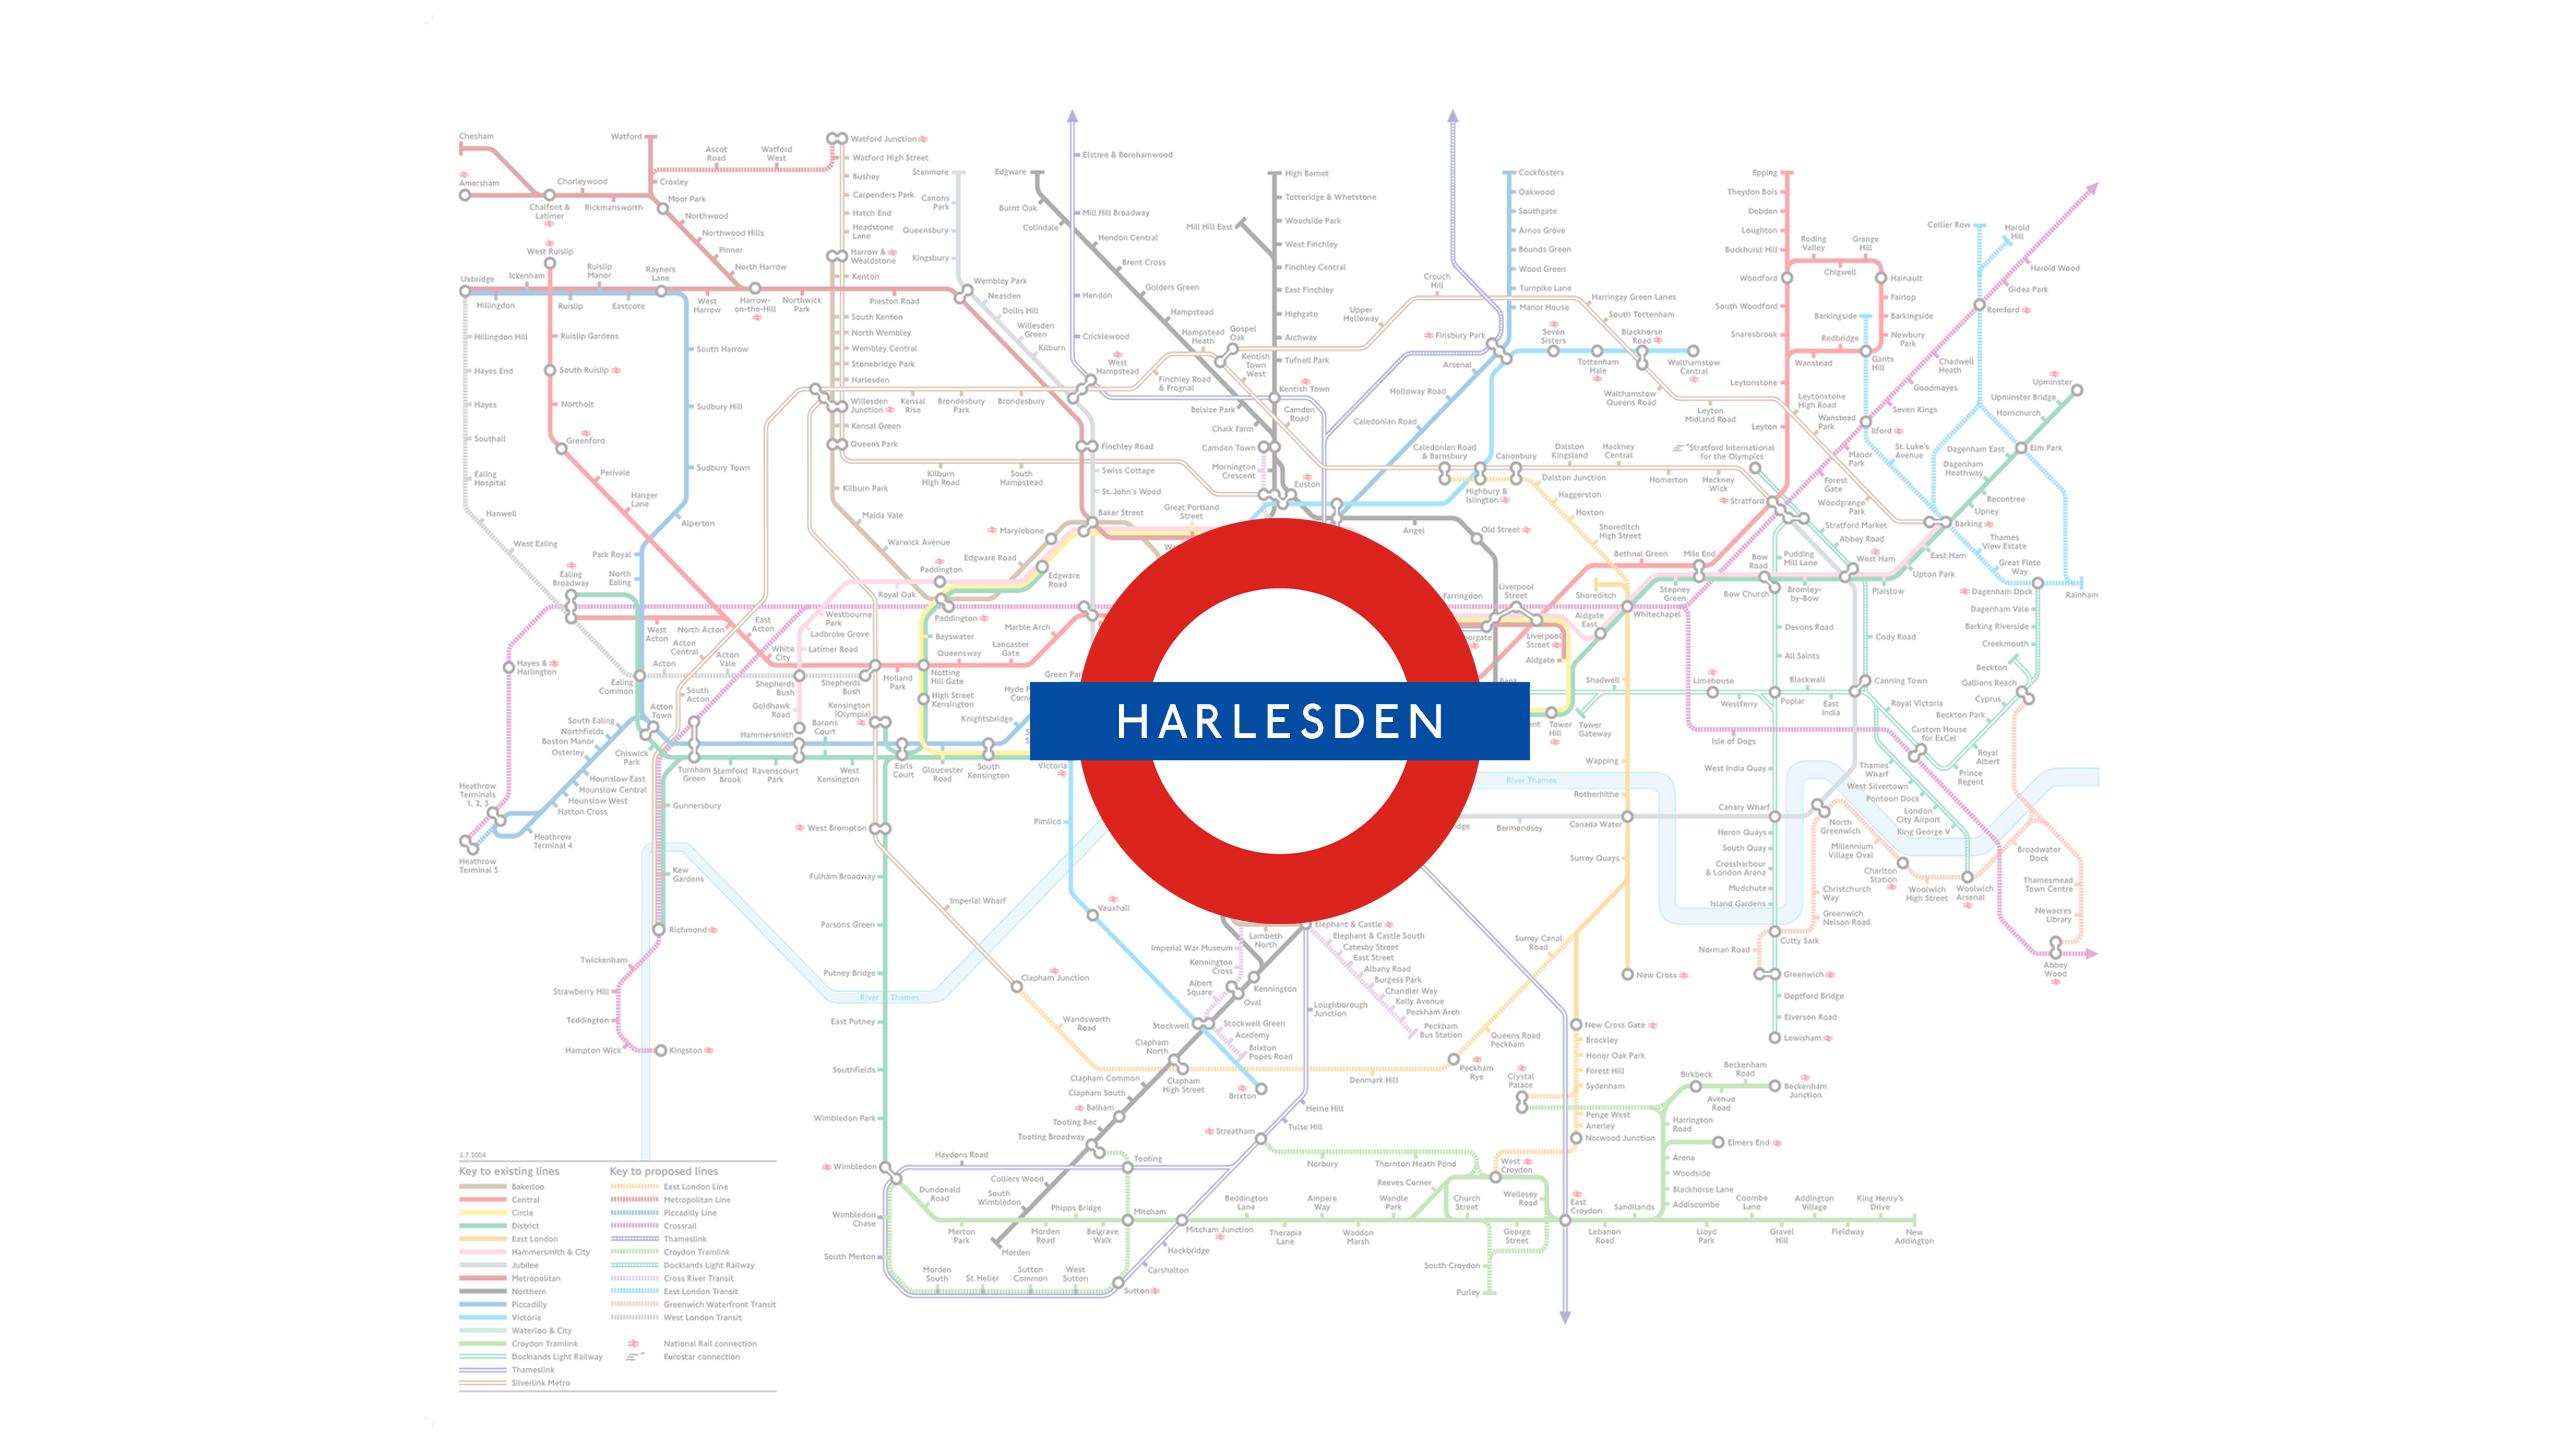 Harlesden (Map)